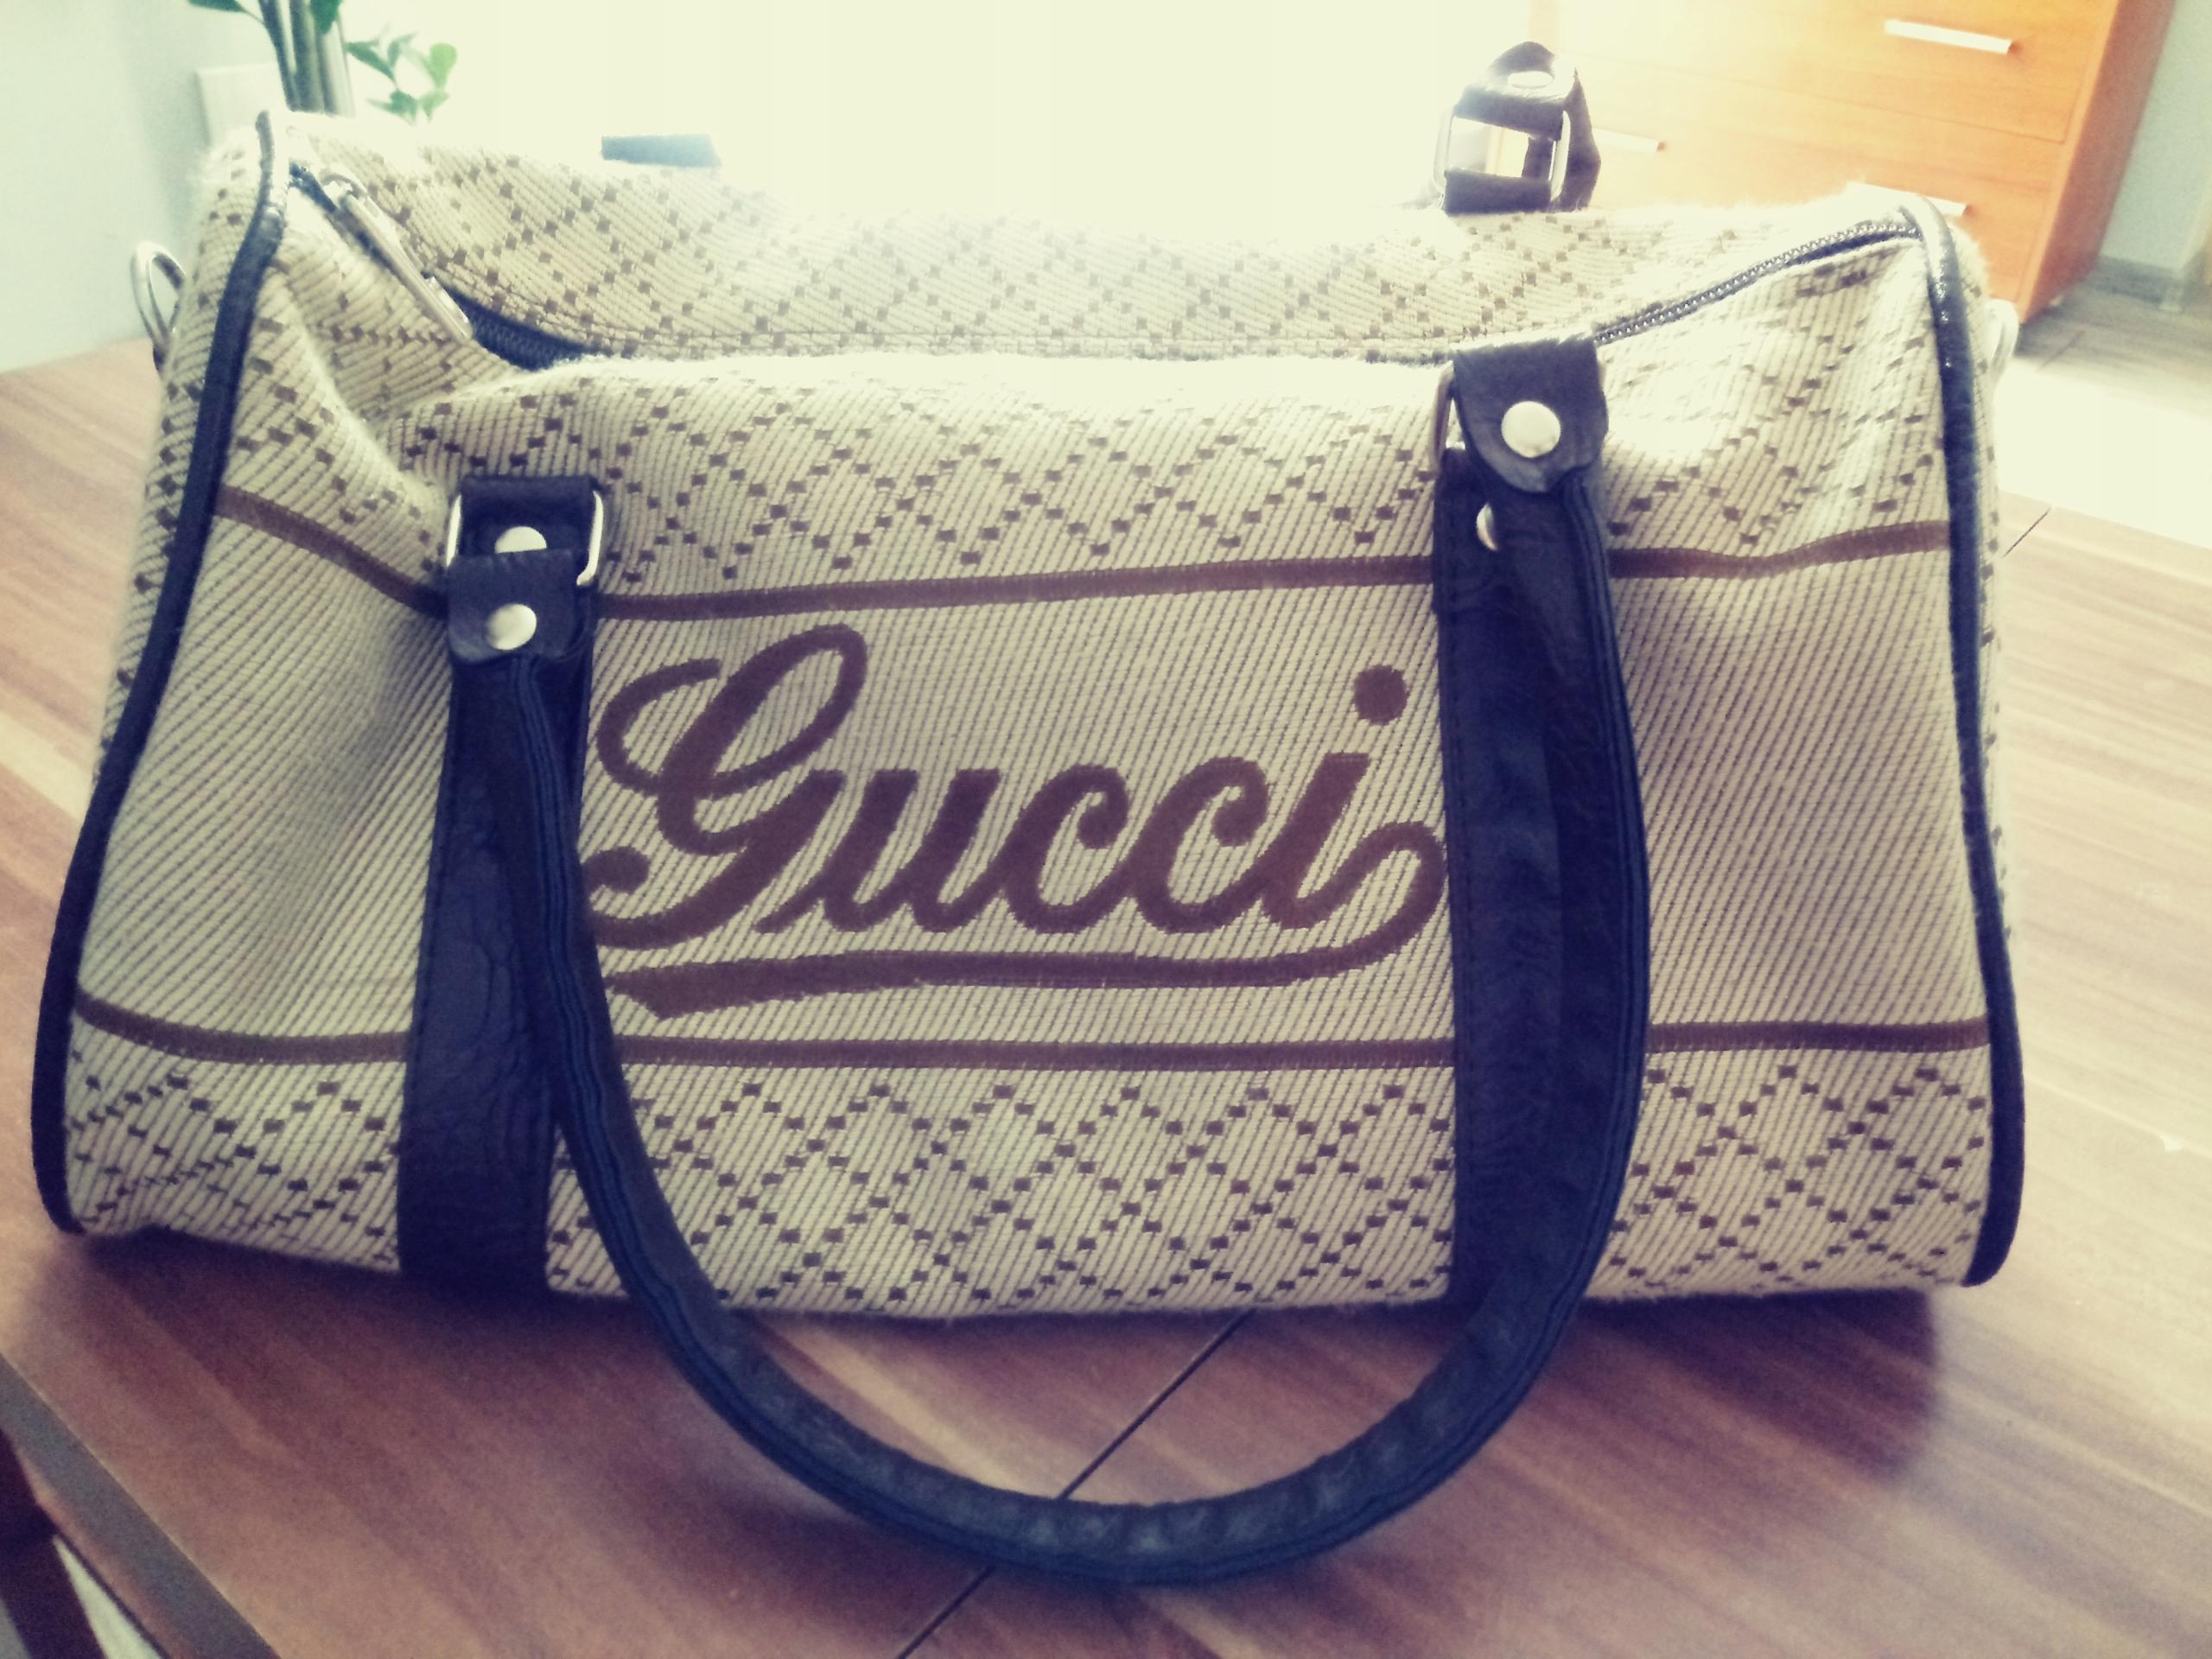 5723ac5e2e5a9 Kolekcjonerska torebka kuferek Gucci - 7479107973 - oficjalne ...